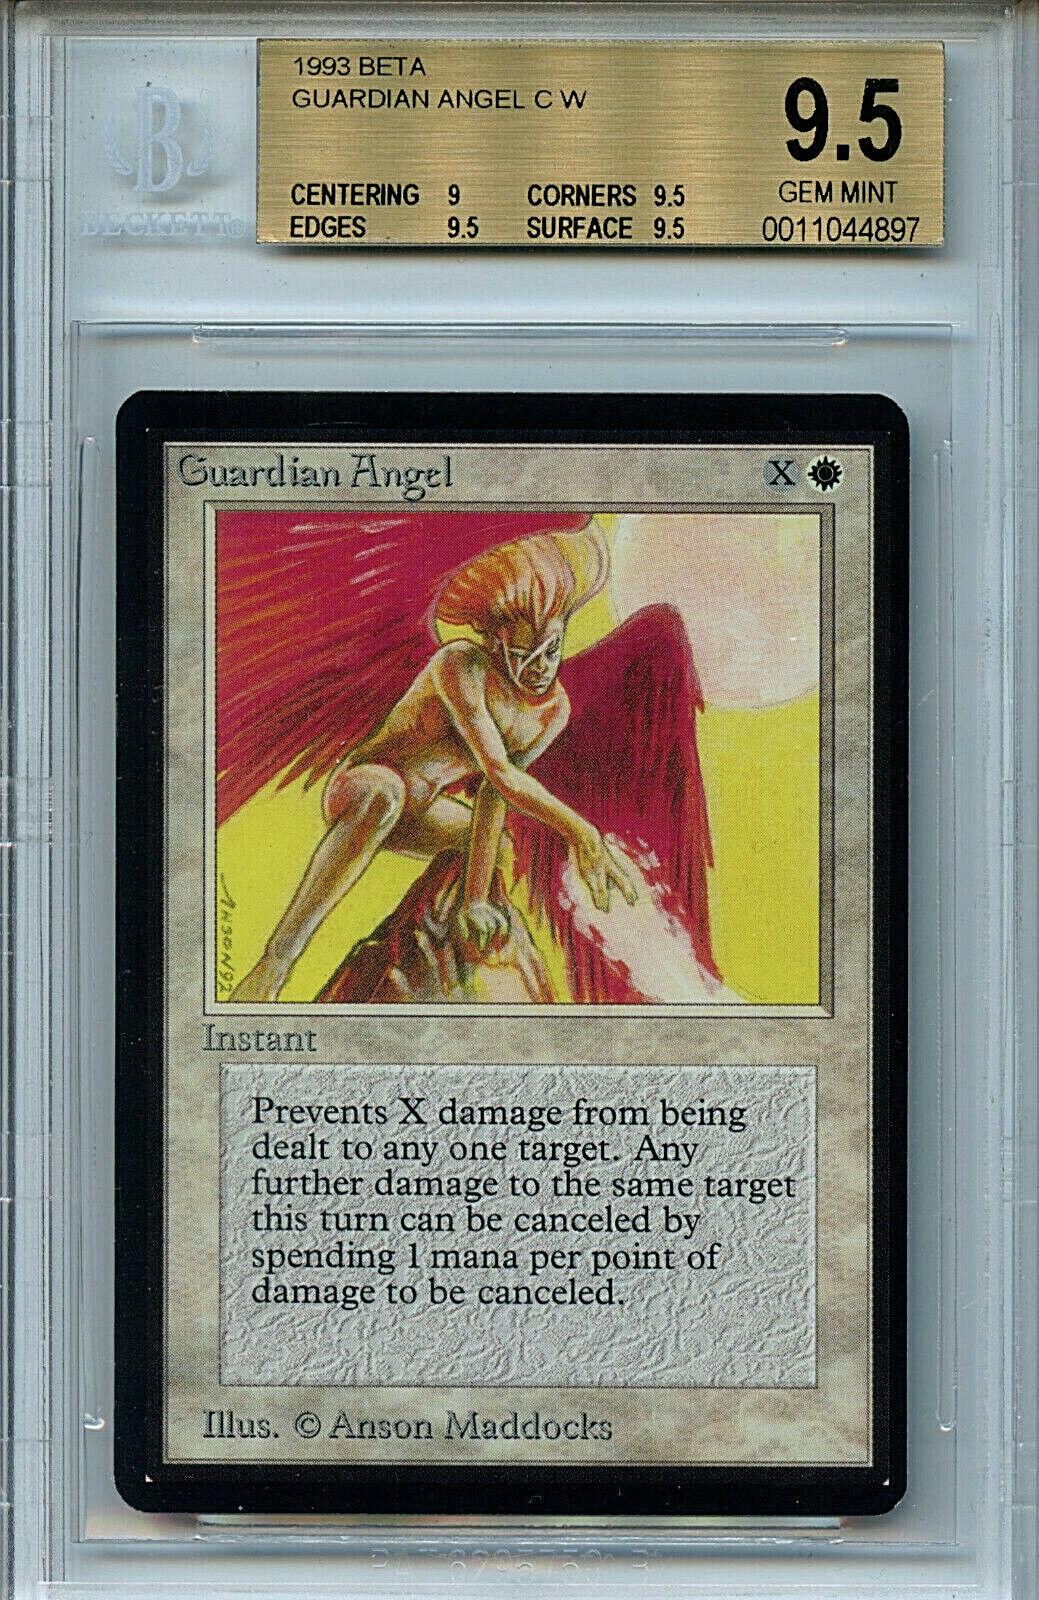 MTG Alpha Guardian Angel BGS 9.5 Gem Mint Magic Card Amricons 4897